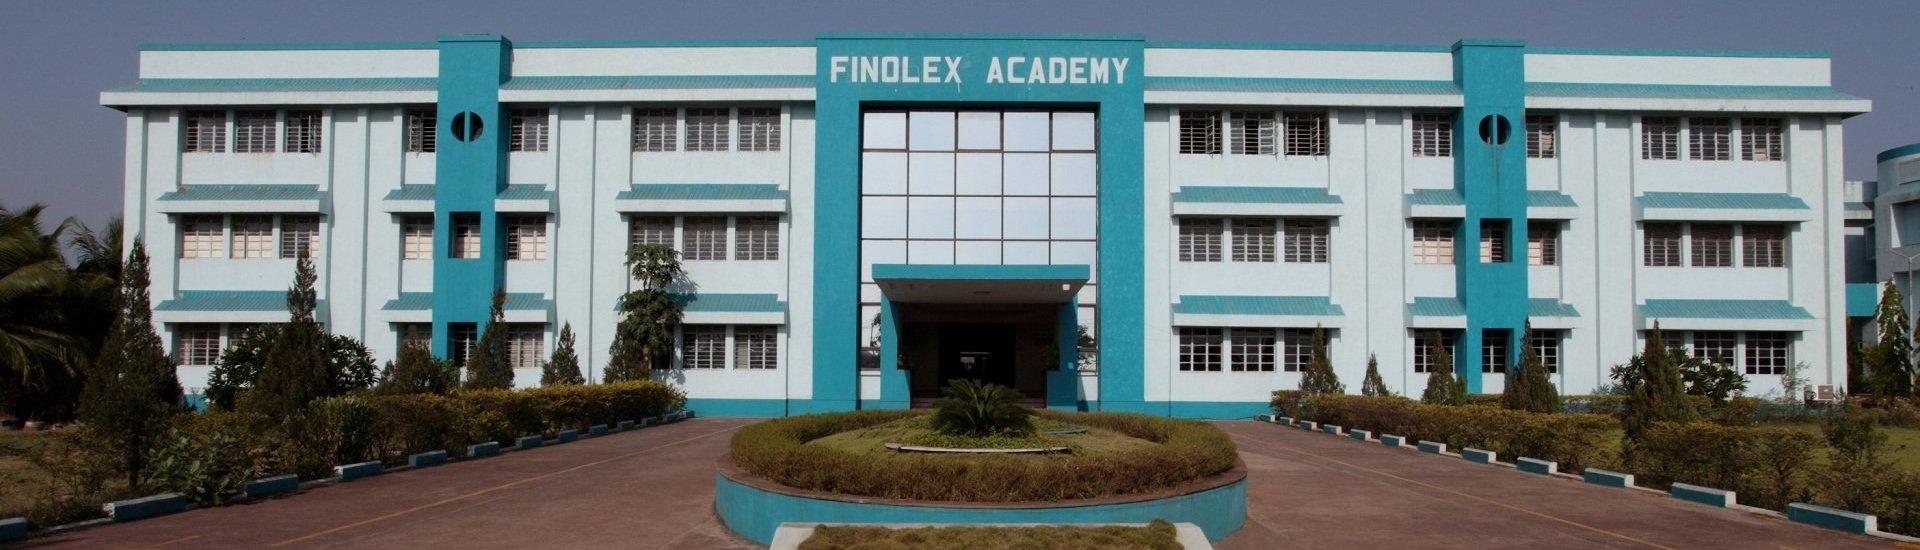 Finolex Academy Of Management And Technology, Ratnagiri